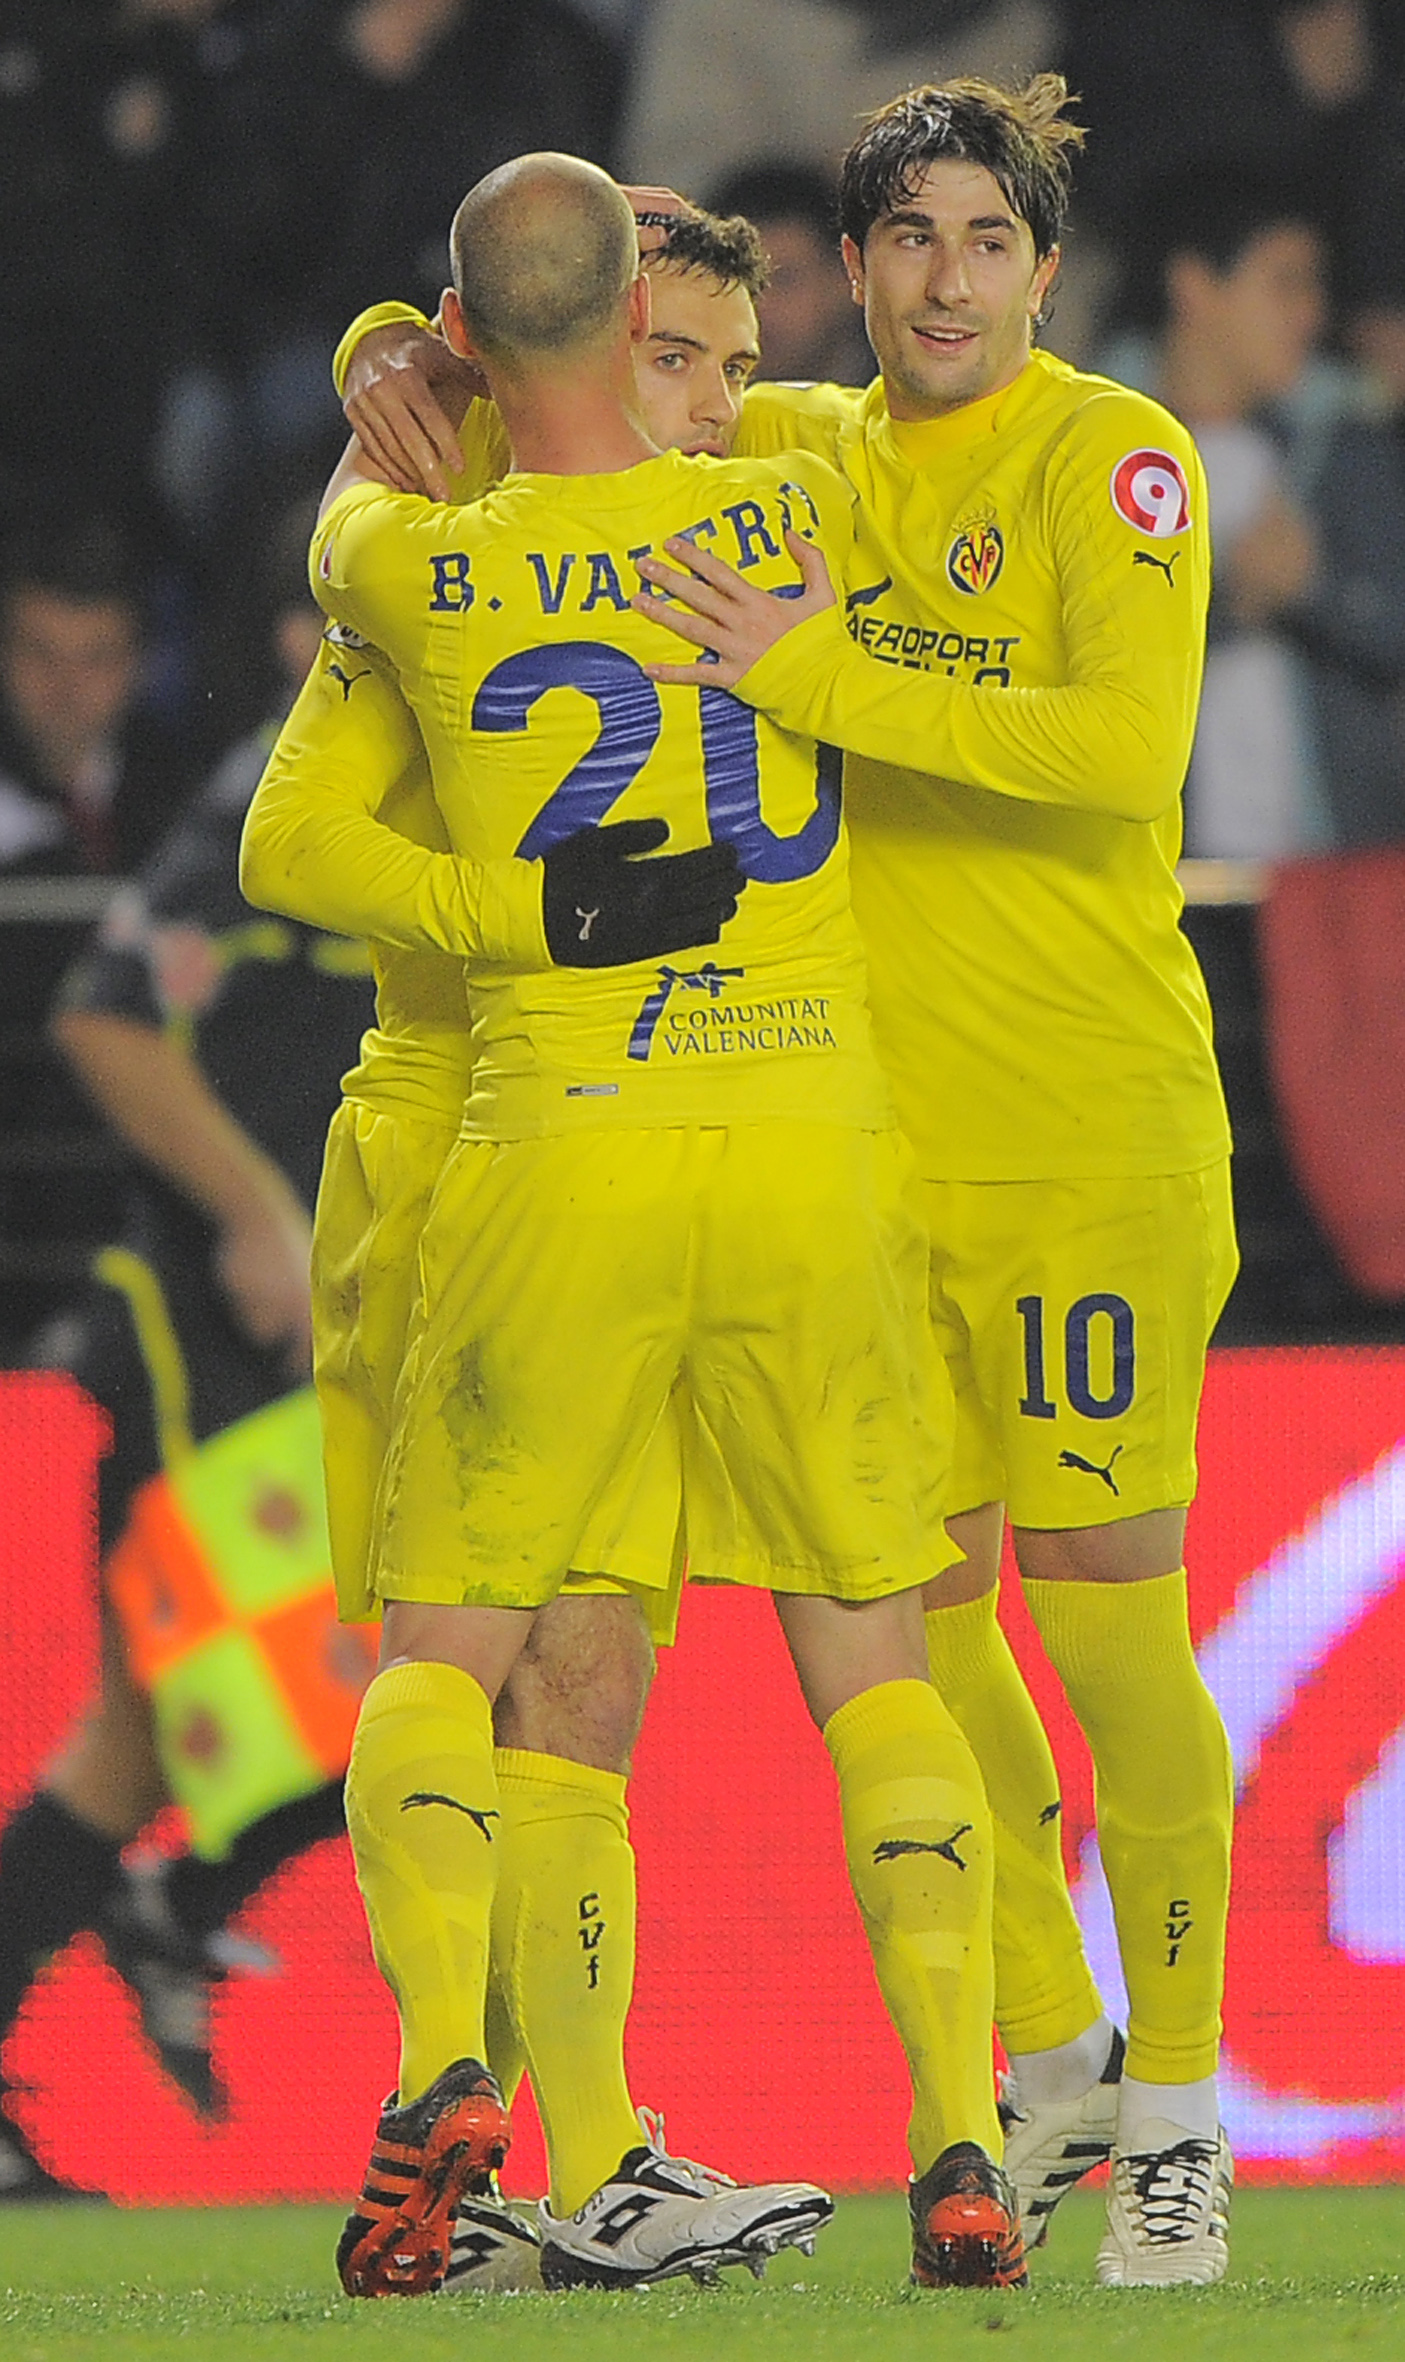 Villarreal's Italian forward Giuseppe Ro